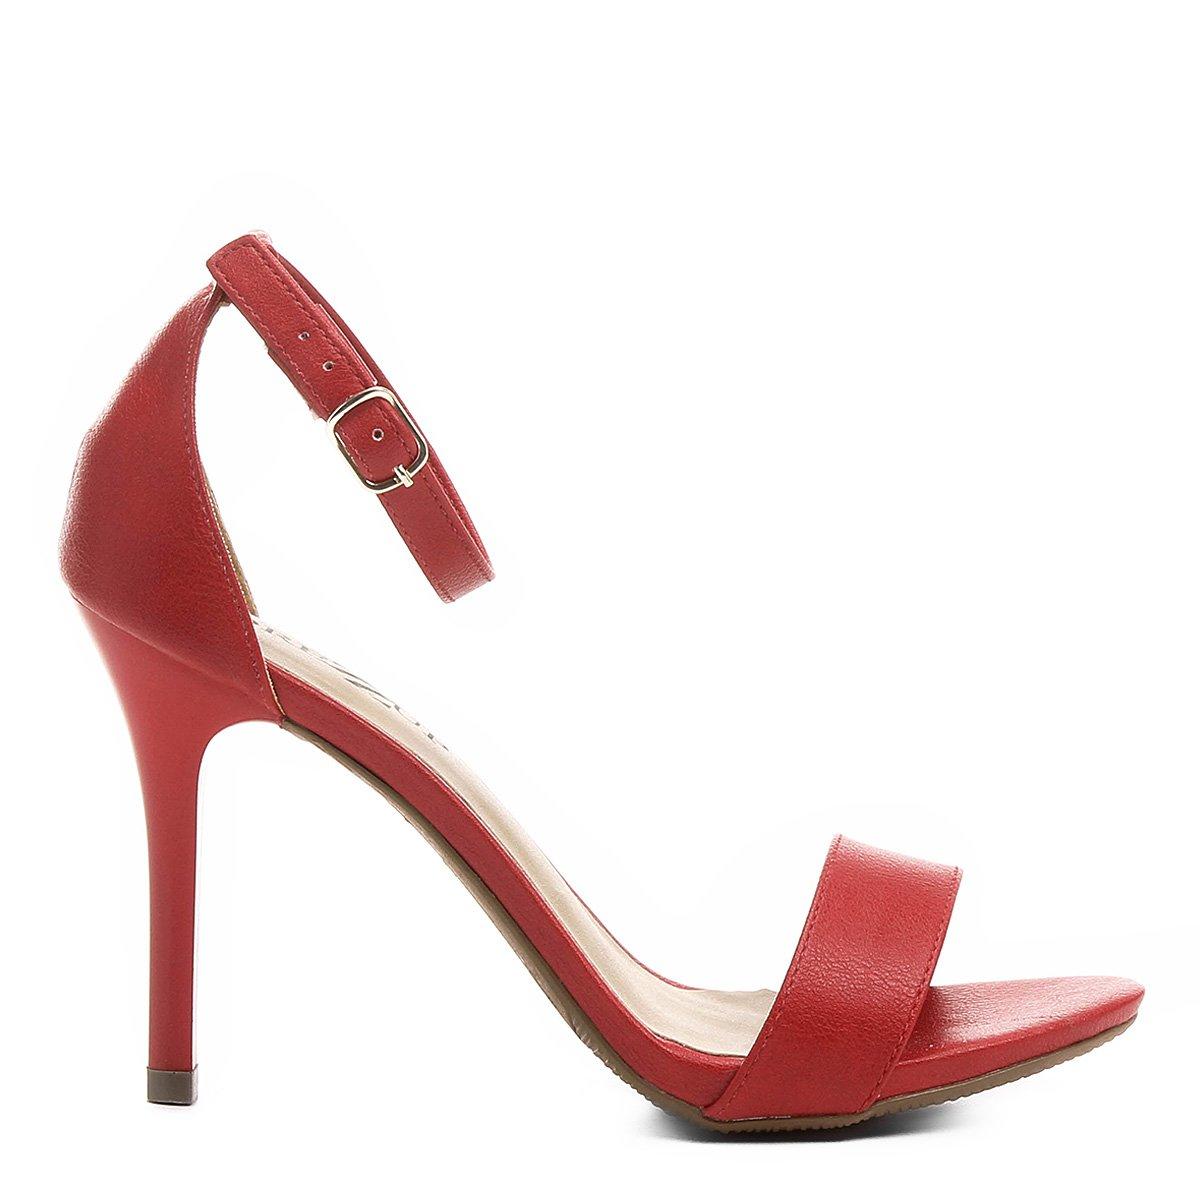 Feminino Vermelho Alto Sandália Drezzup Vermelho Fino Alto Salto Fino Feminino Drezzup Sandália Salto Sandália na71Awqf